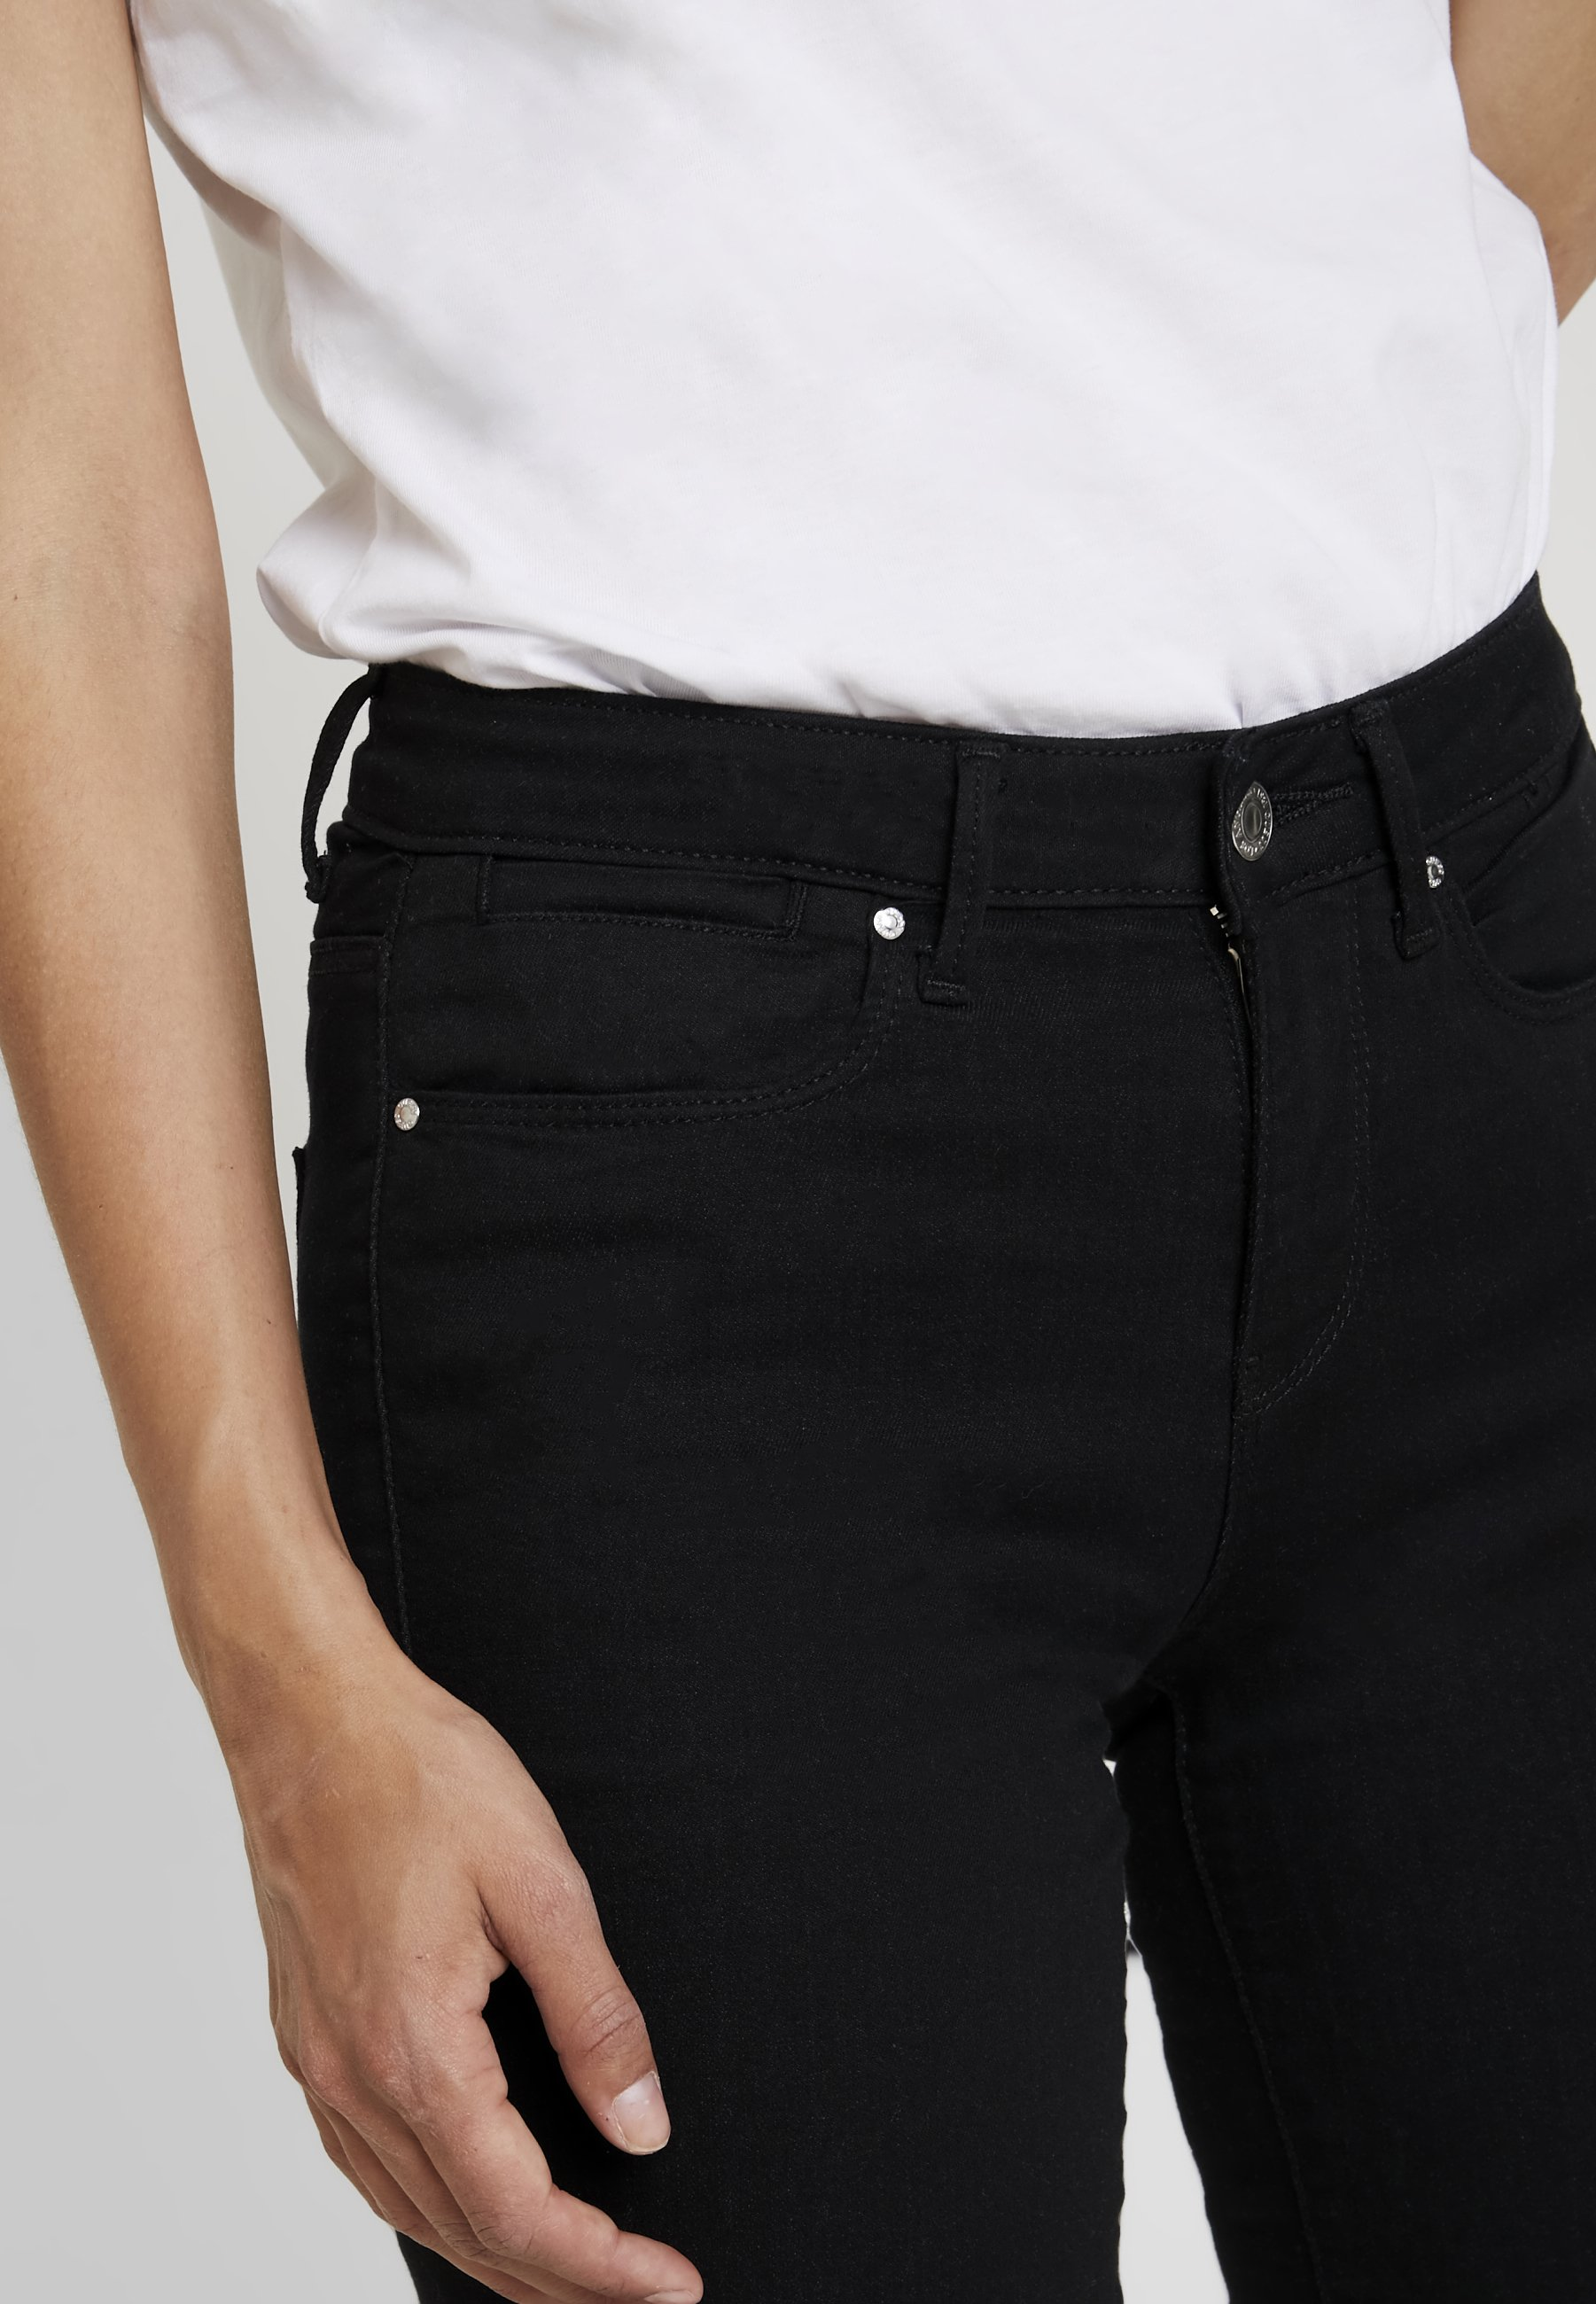 A996 MidJeans Jegging Black Skinny Guess Jet tsCohQxdrB